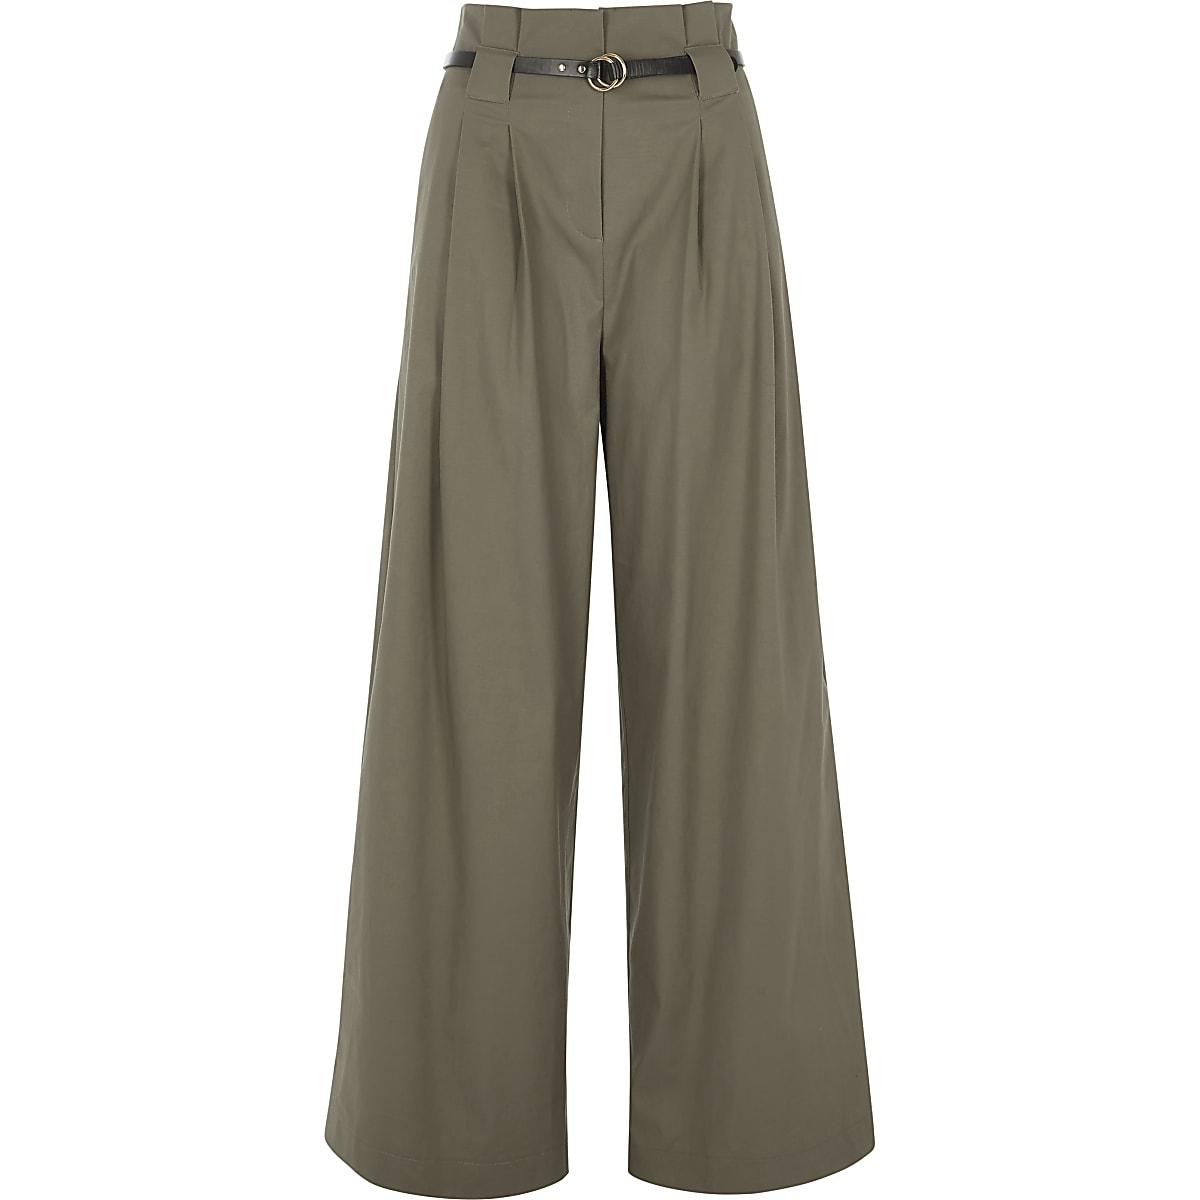 Khaki high waisted belted wide leg pants